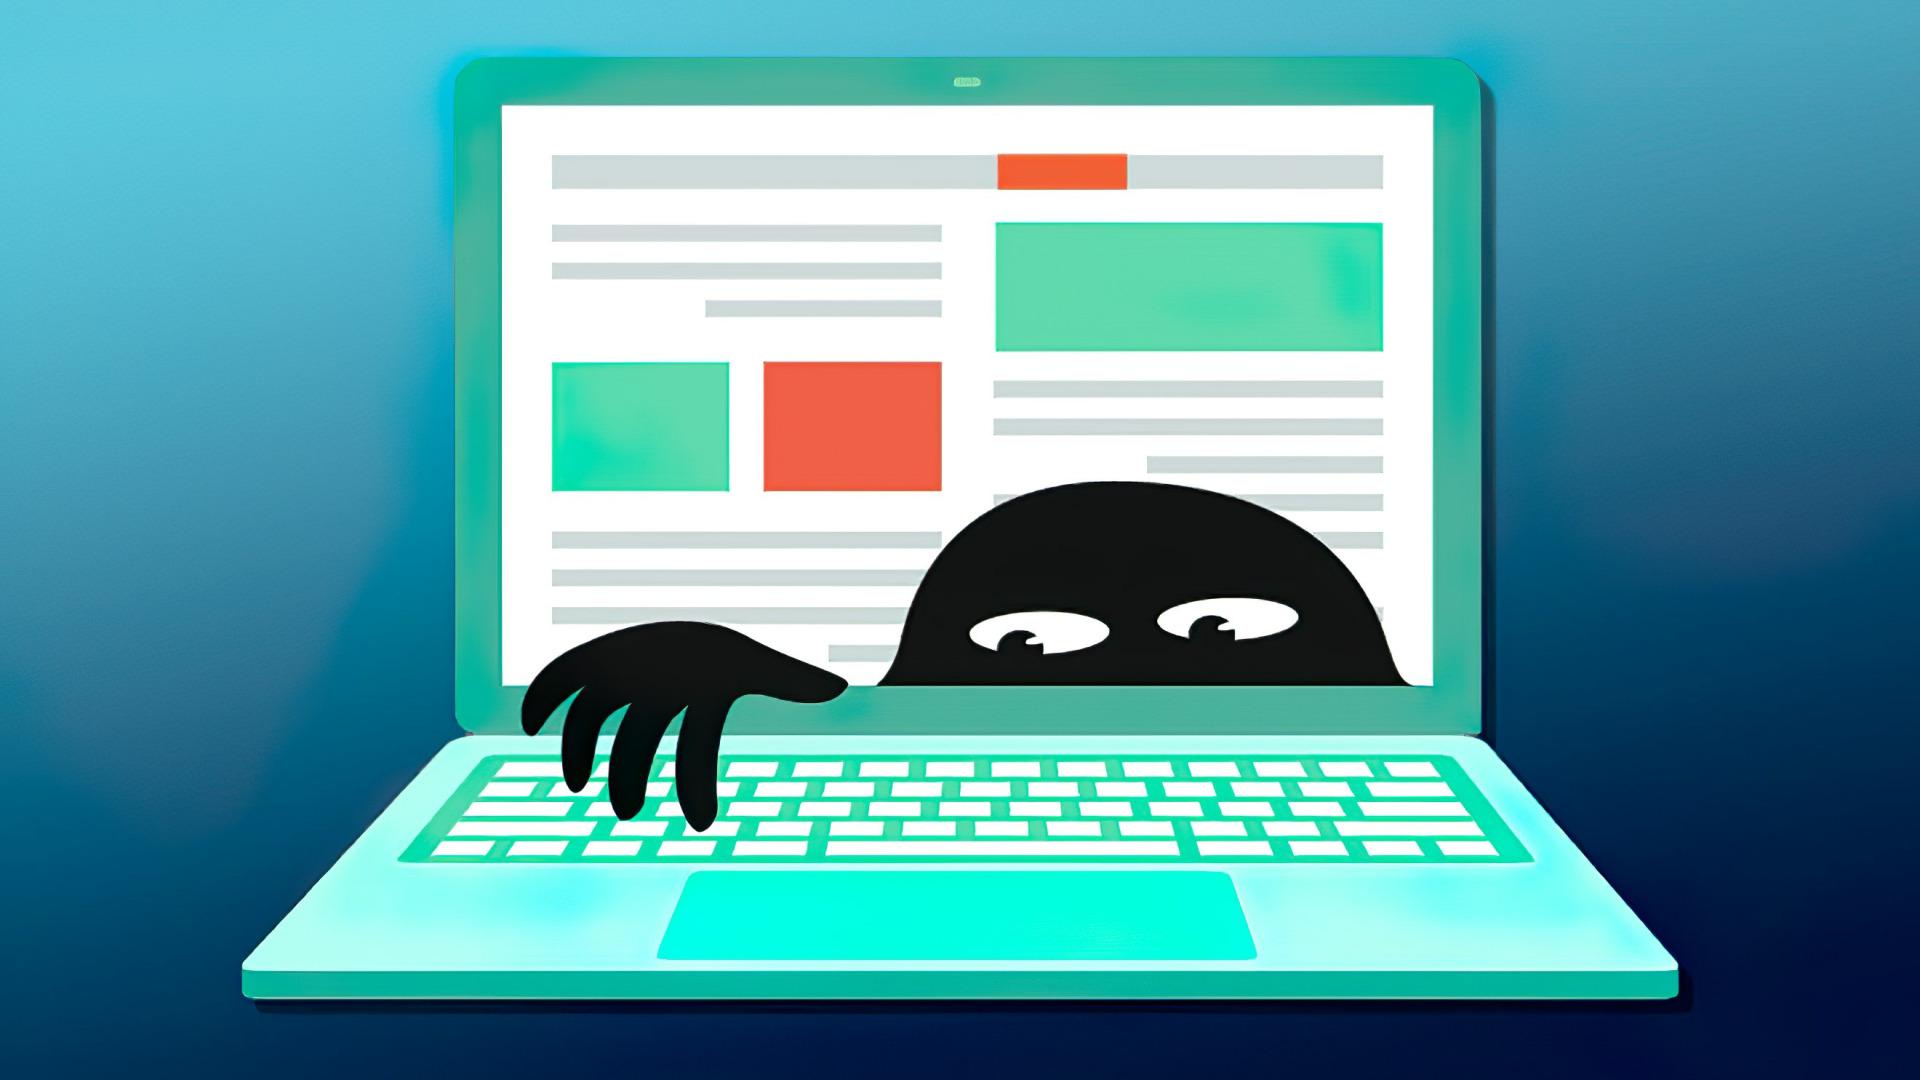 Sicherheit, Sicherheitslücke, Leak, Hacker, Security, Malware, Hack, Angriff, Bug, Virus, Trojaner, Kriminalität, Schadsoftware, Exploit, Cybercrime, Cybersecurity, Ransomware, Hacking, Spam, Hackerangriff, Erpressung, Internetkriminalität, Phishing, Ddos, Warnung, Darknet, Hacken, Hacker Angriffe, Hacker Angriff, Attack, Ransom, Hacks, Viren, Gehackt, Crime, Schädling, China Hacker, Russische Hacker, Adware, Security Report, Error, Malware Warnung, Security Bulletin, Promi-Hacker, Android Malware, Phisher, Secure, Breaking